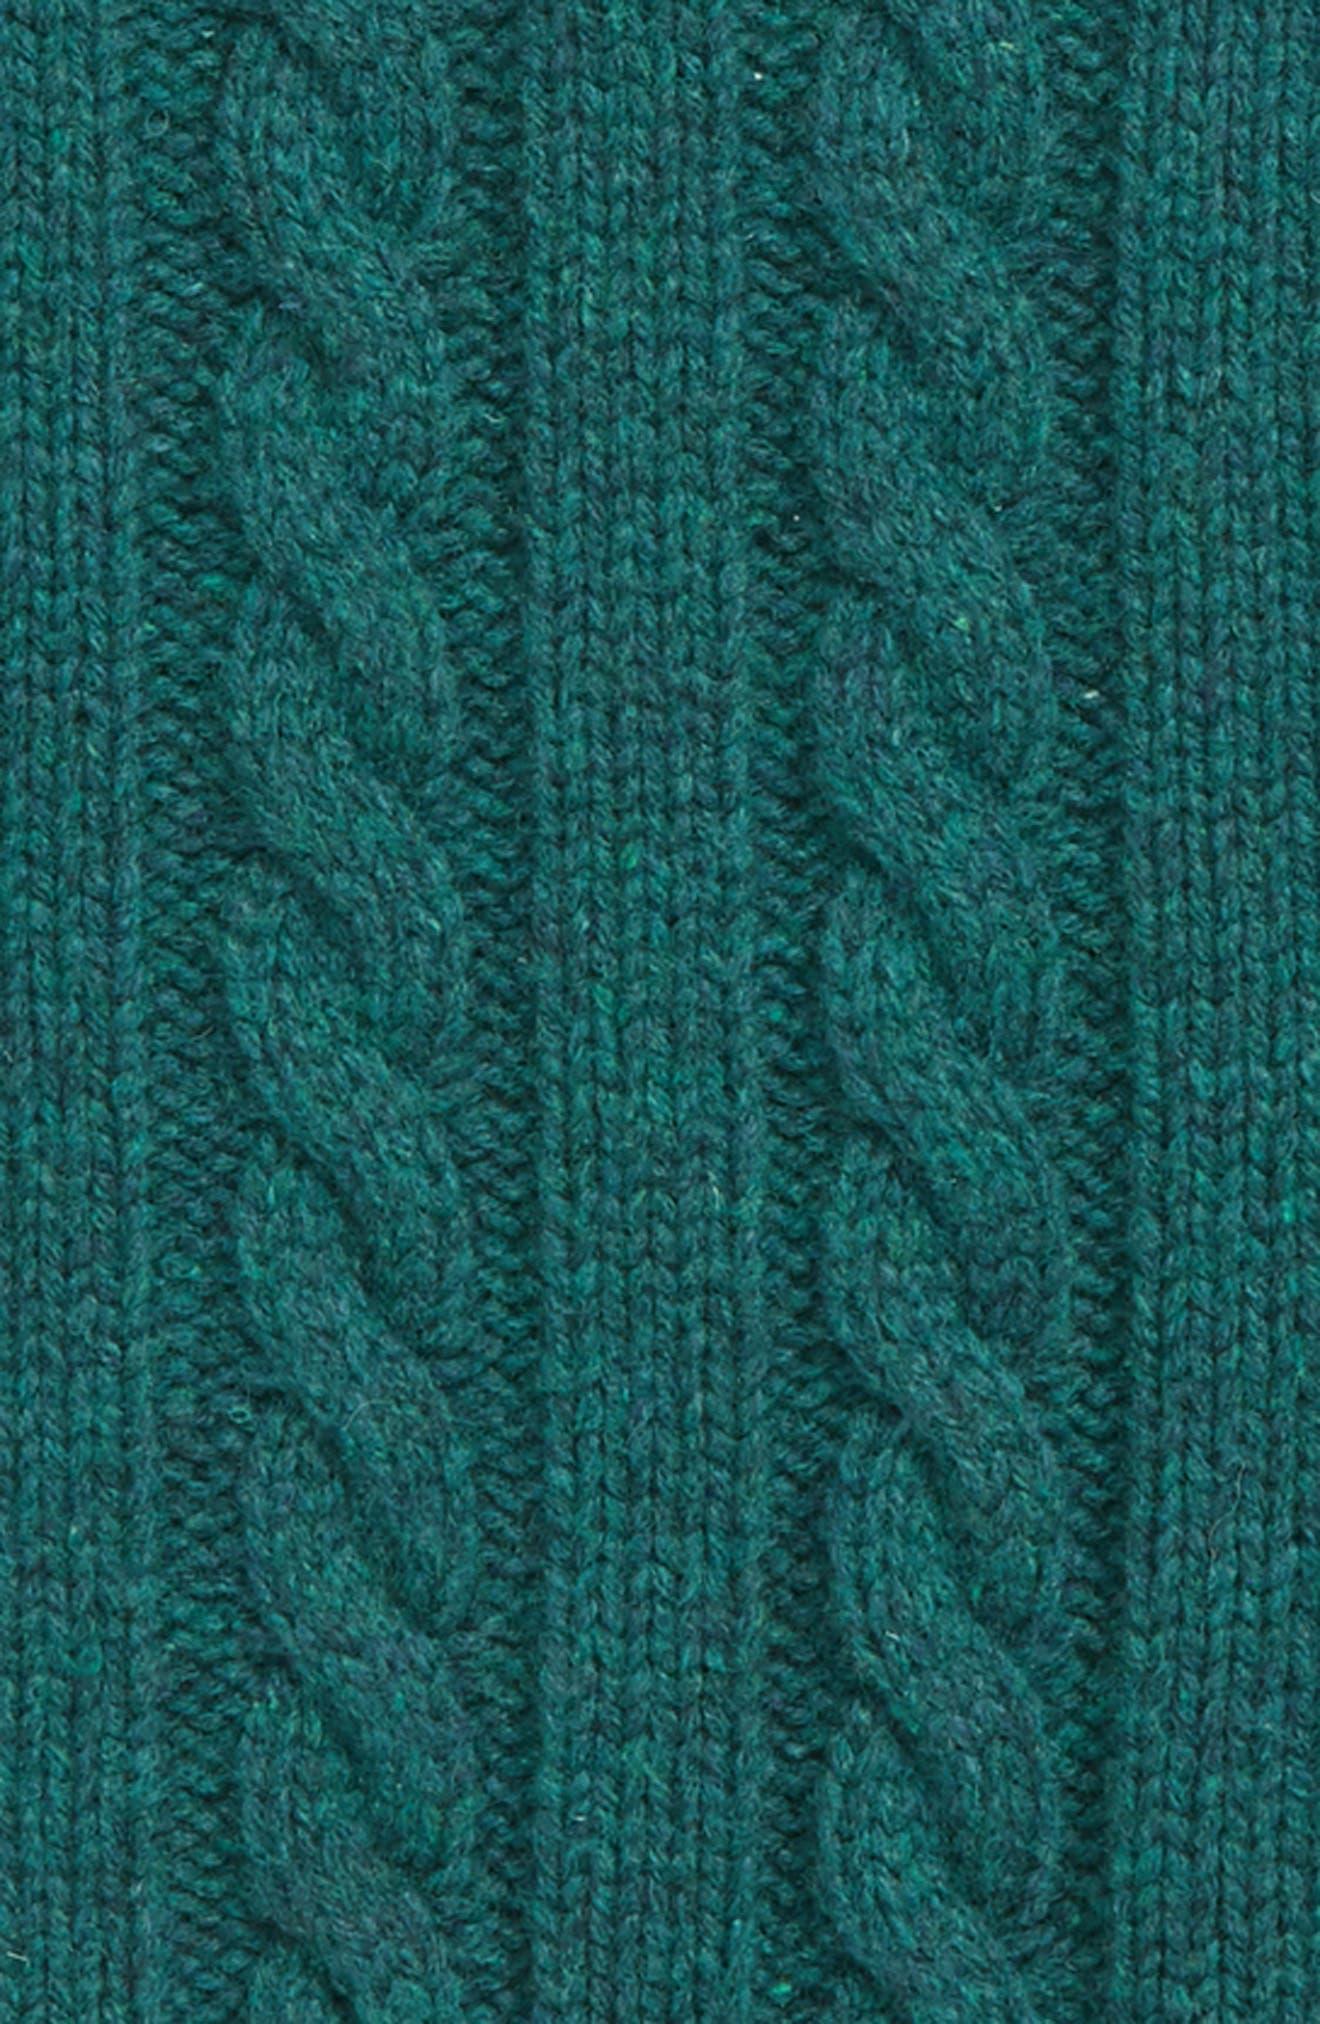 MINI BODEN,                             Chunky Knit Sweater,                             Alternate thumbnail 2, color,                             STORM GREEN